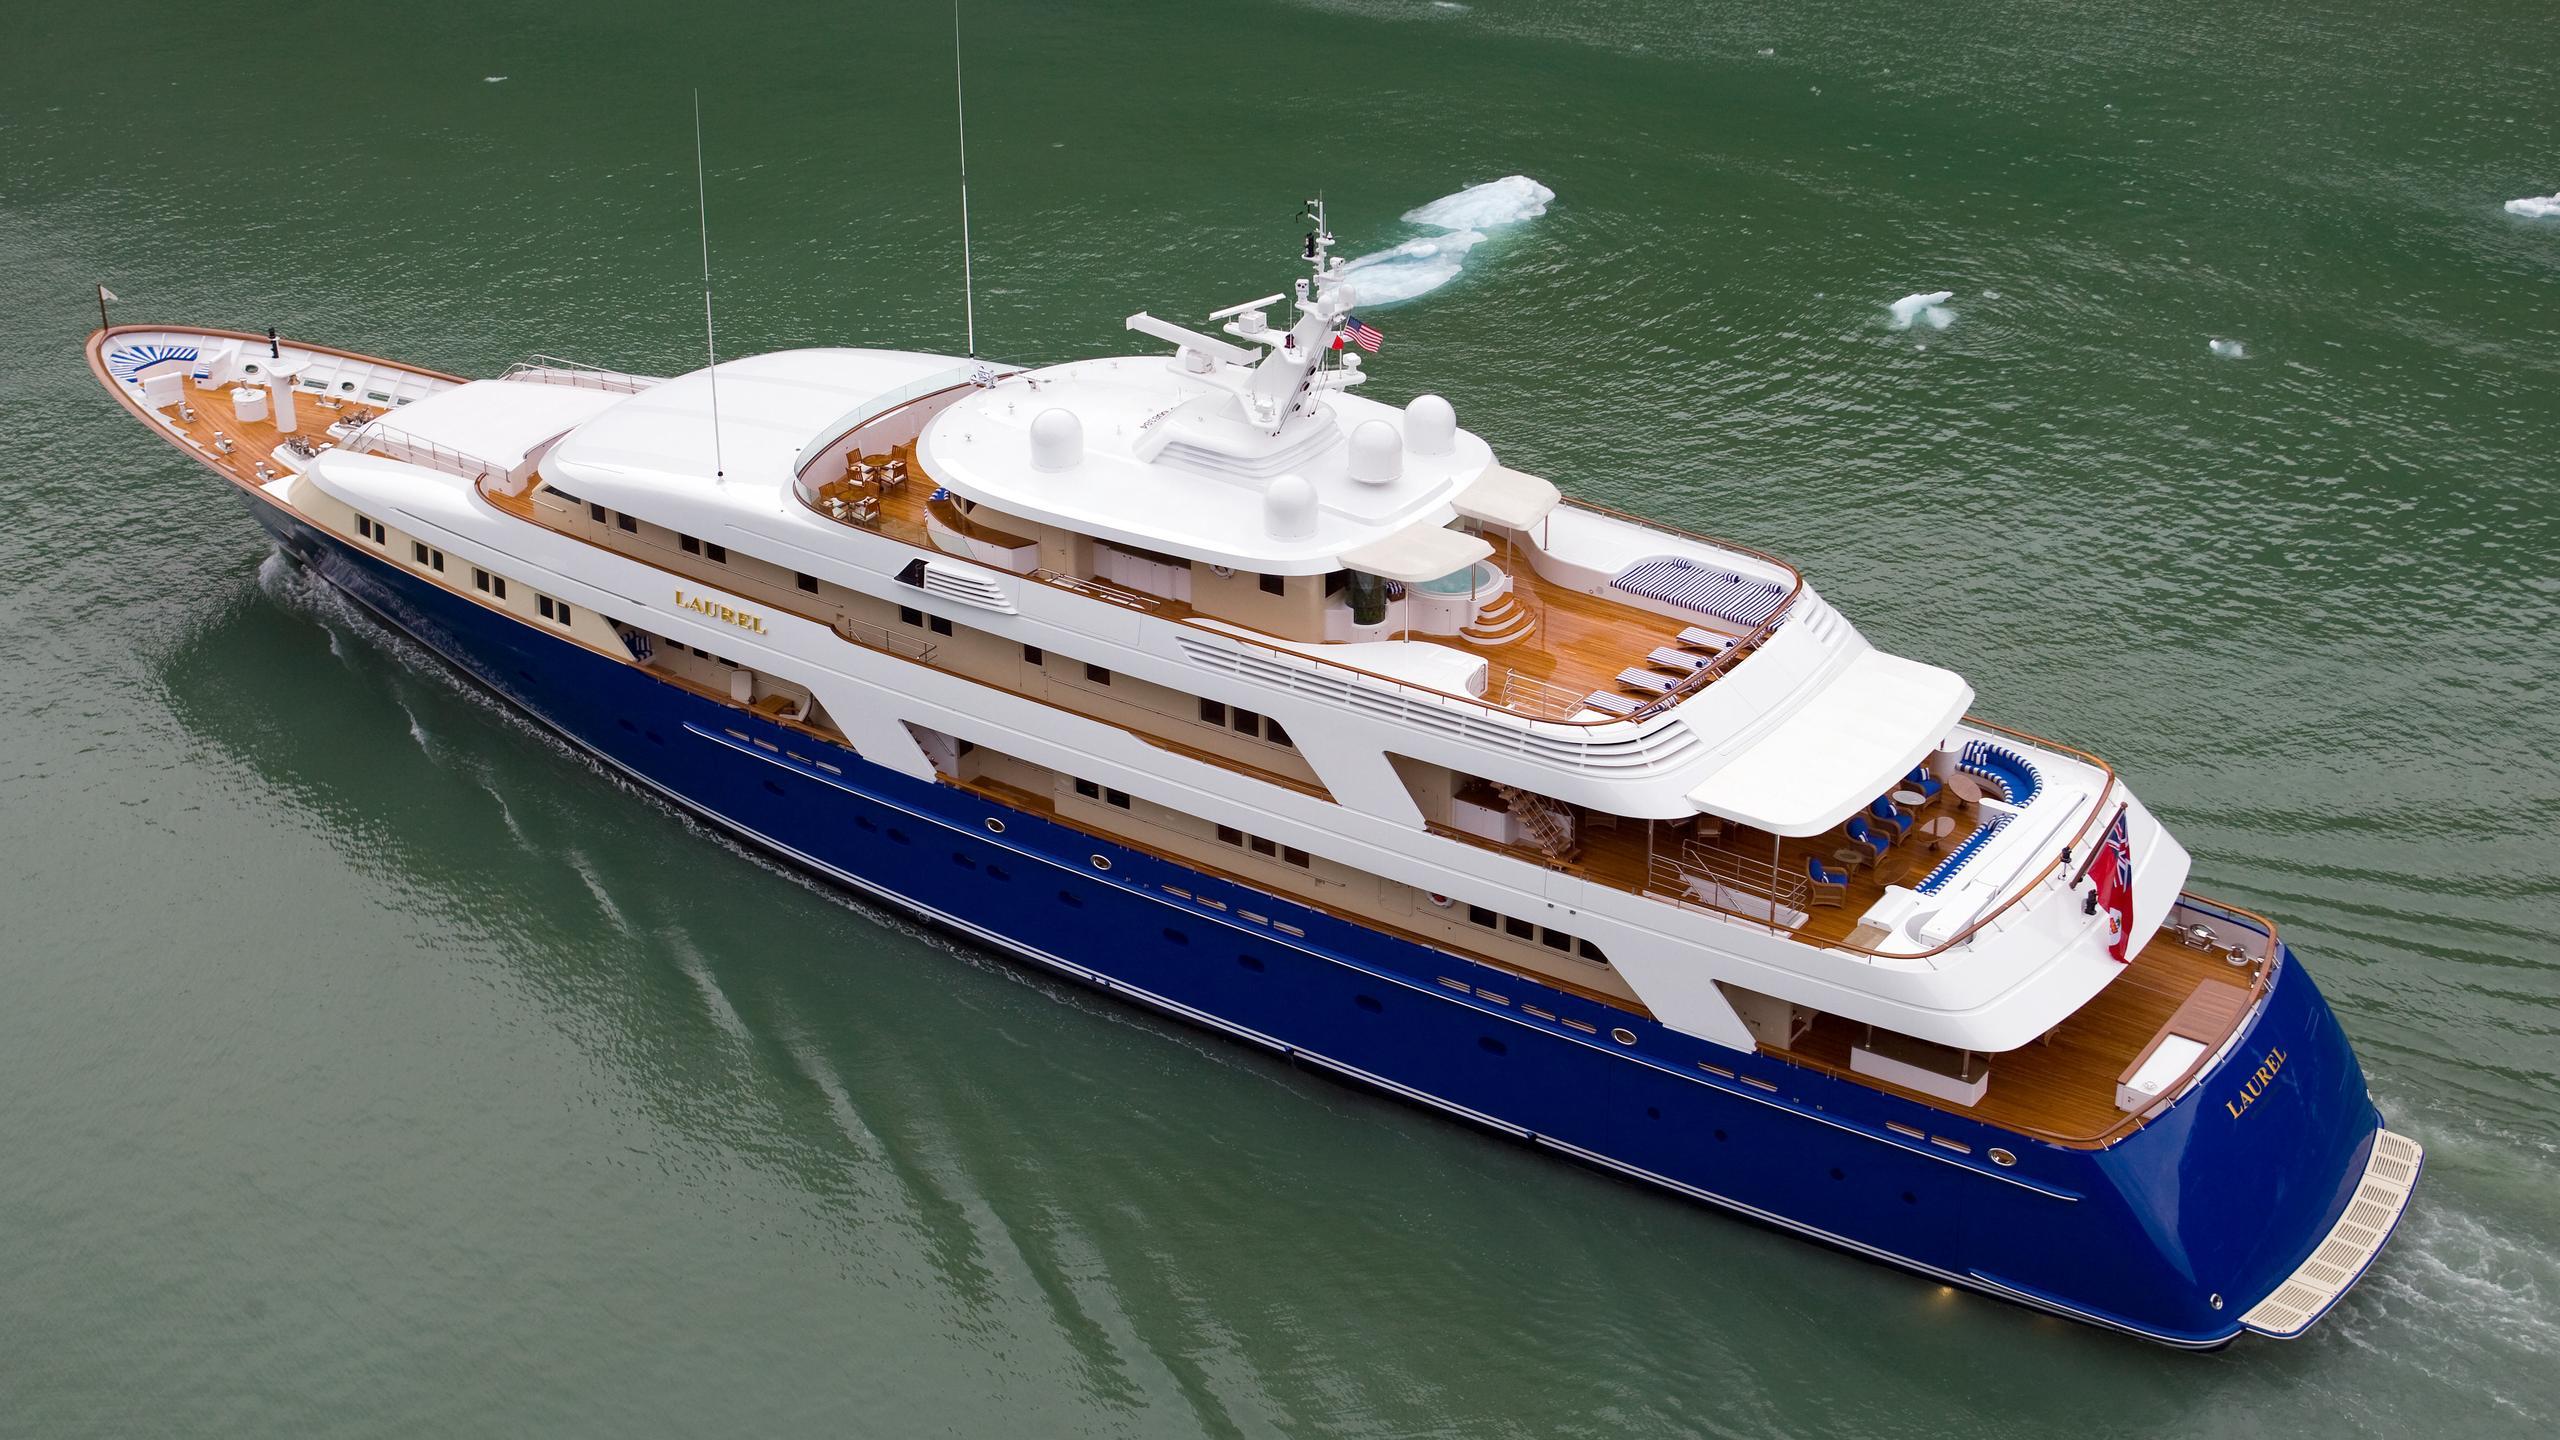 laurel-motor-yacht-delta-marine-2006-73m-aerial